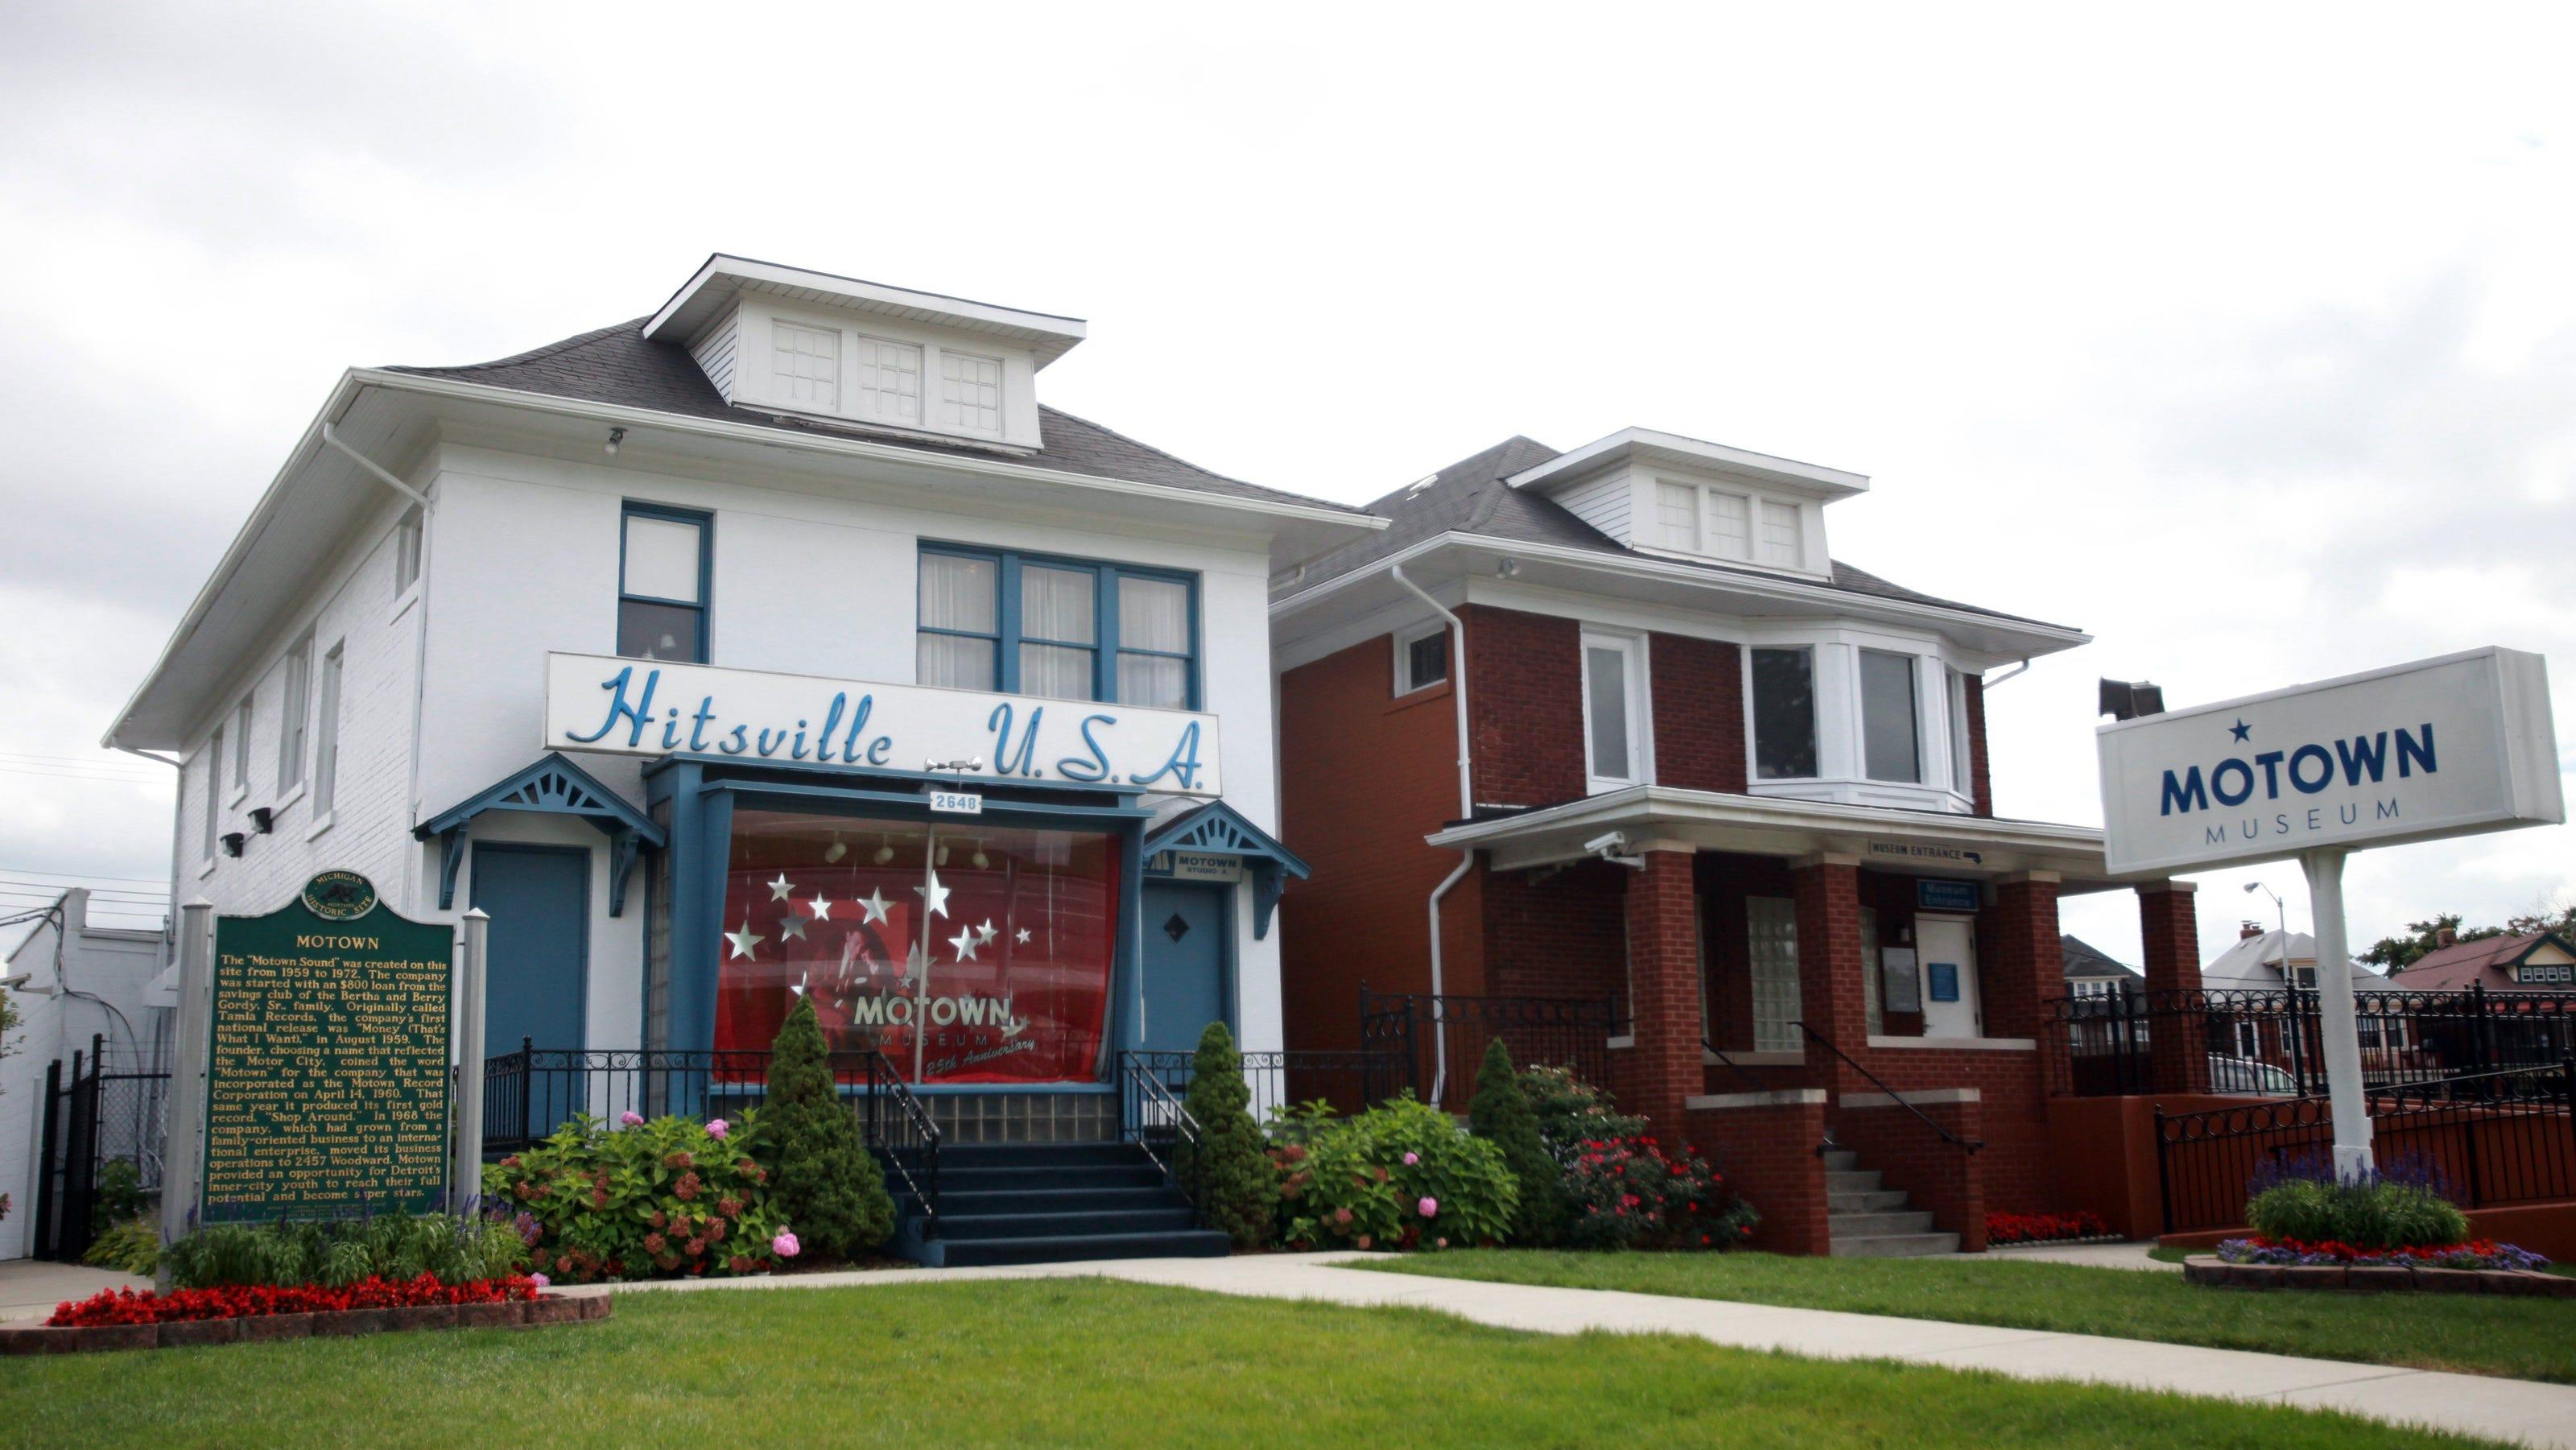 2.16 Hitsville USA Studio & Museum